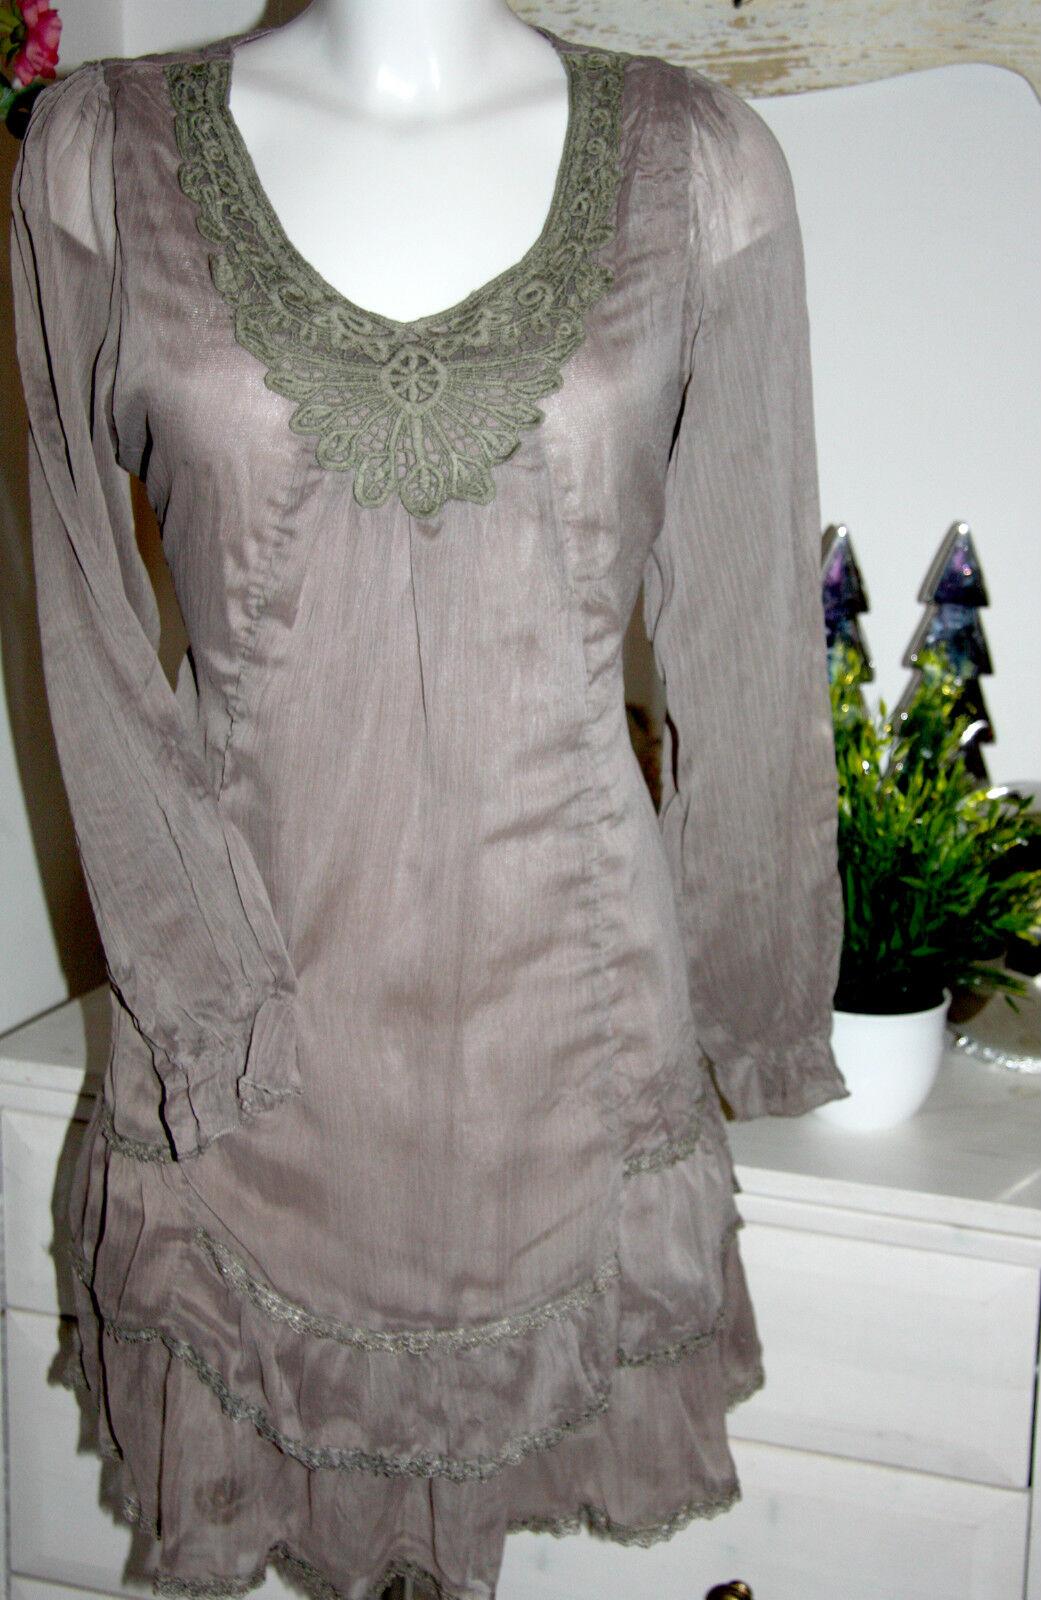 Nostalgia túnica dress vestido de manga manga manga larga Dark taupé Talla  L-XL CNC. 40-44 nuevo 56ea1c